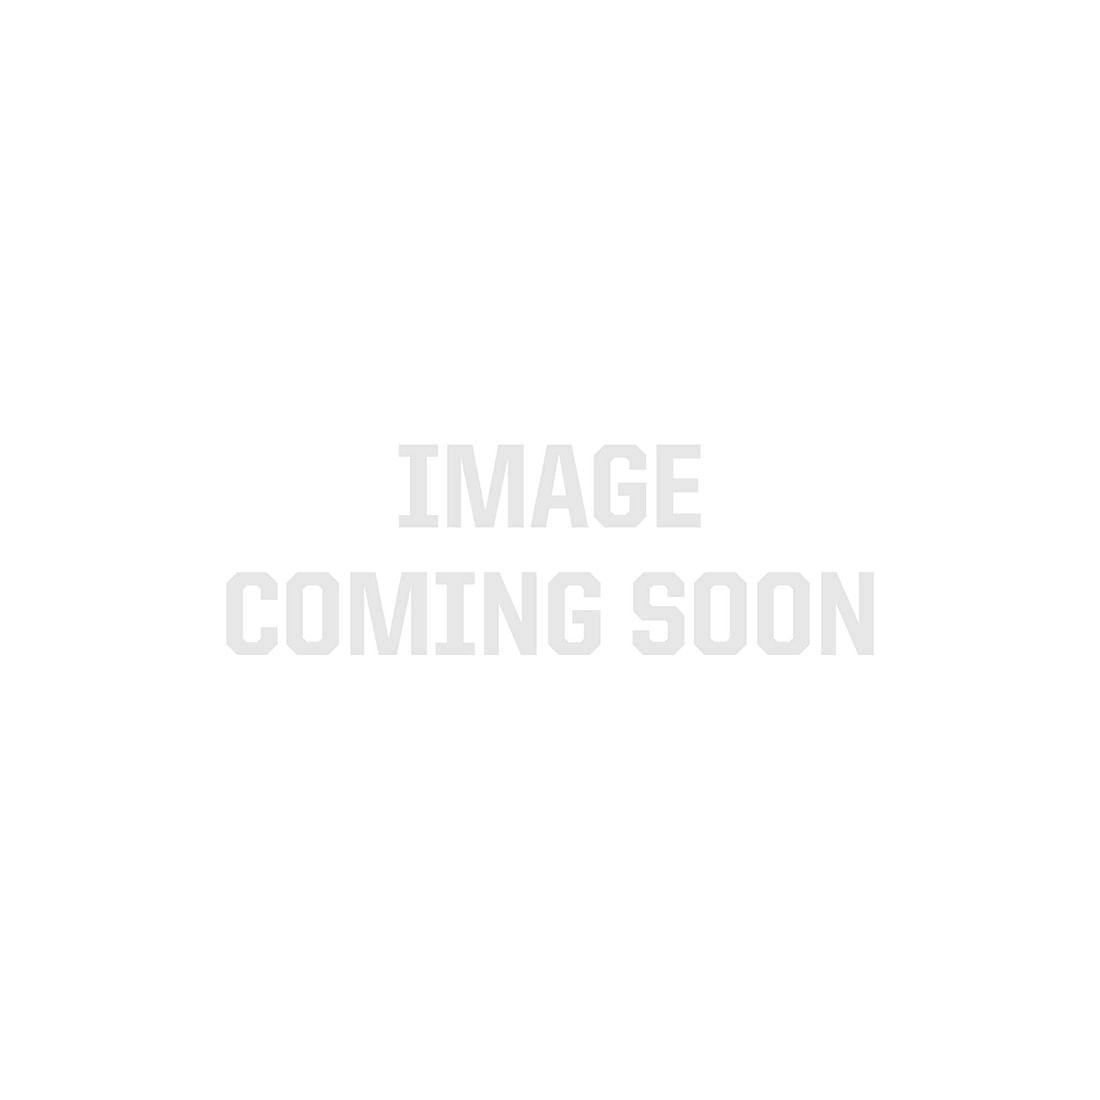 Kichler Design Pro LED Interconnect (21 inches long) (Black) (Optional)